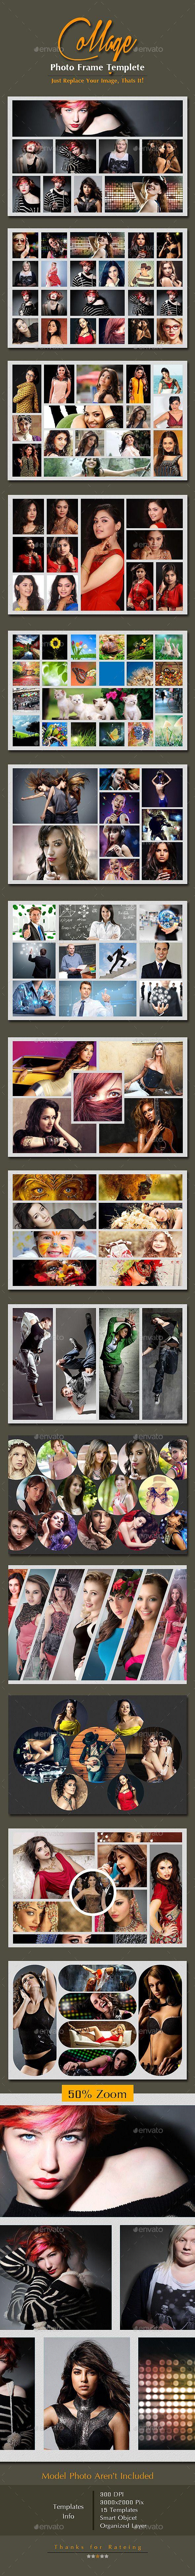 College Photo Frame Template PSD #design Download: http://graphicriver.net/item/college-photo-frame-templete/9959997?ref=ksioks